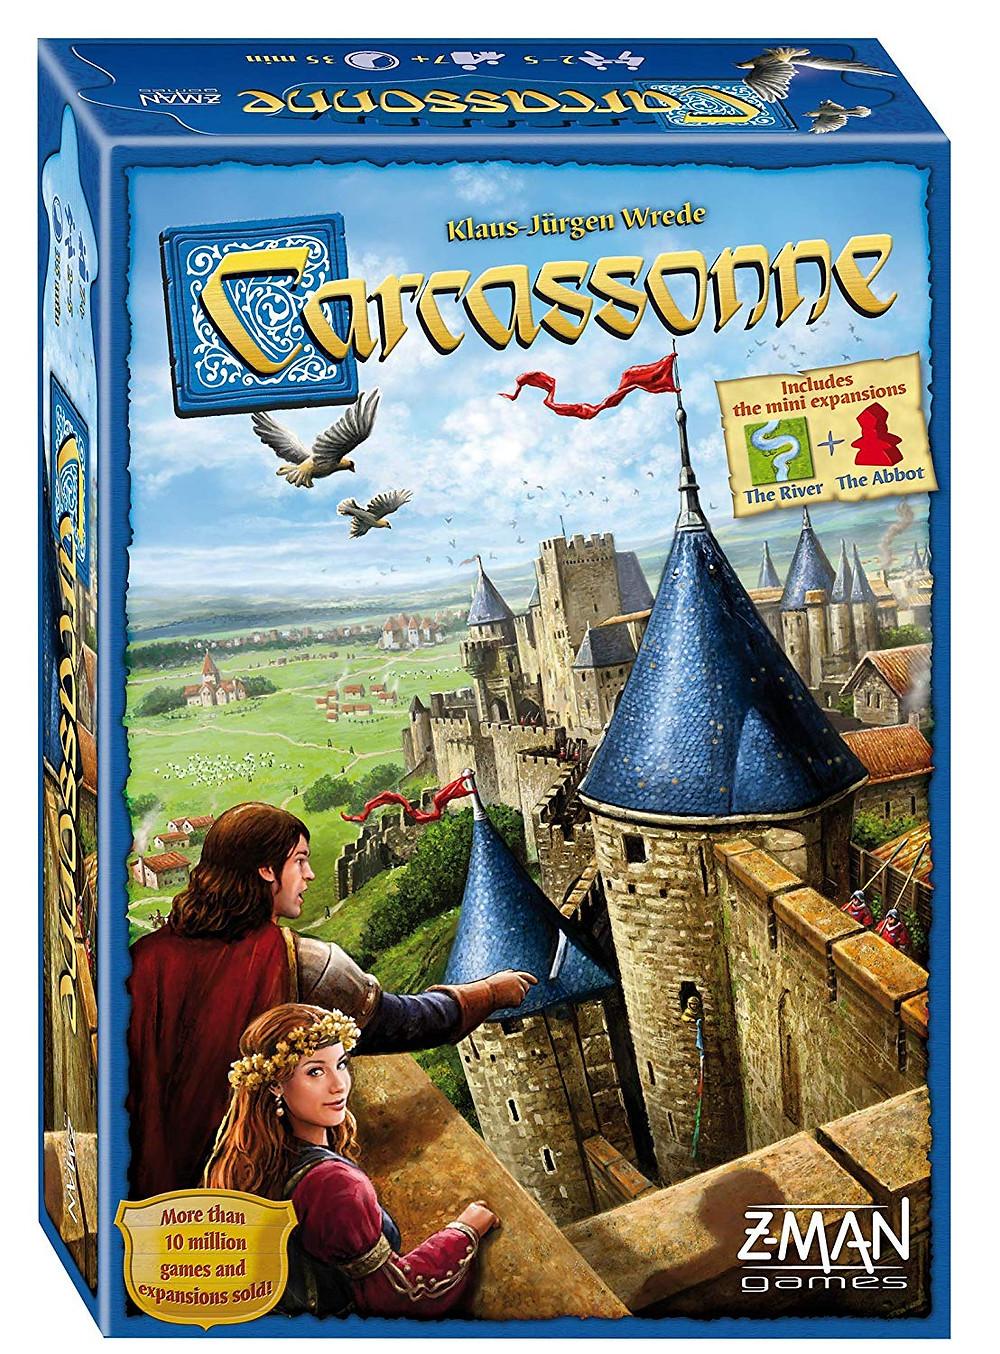 A board game